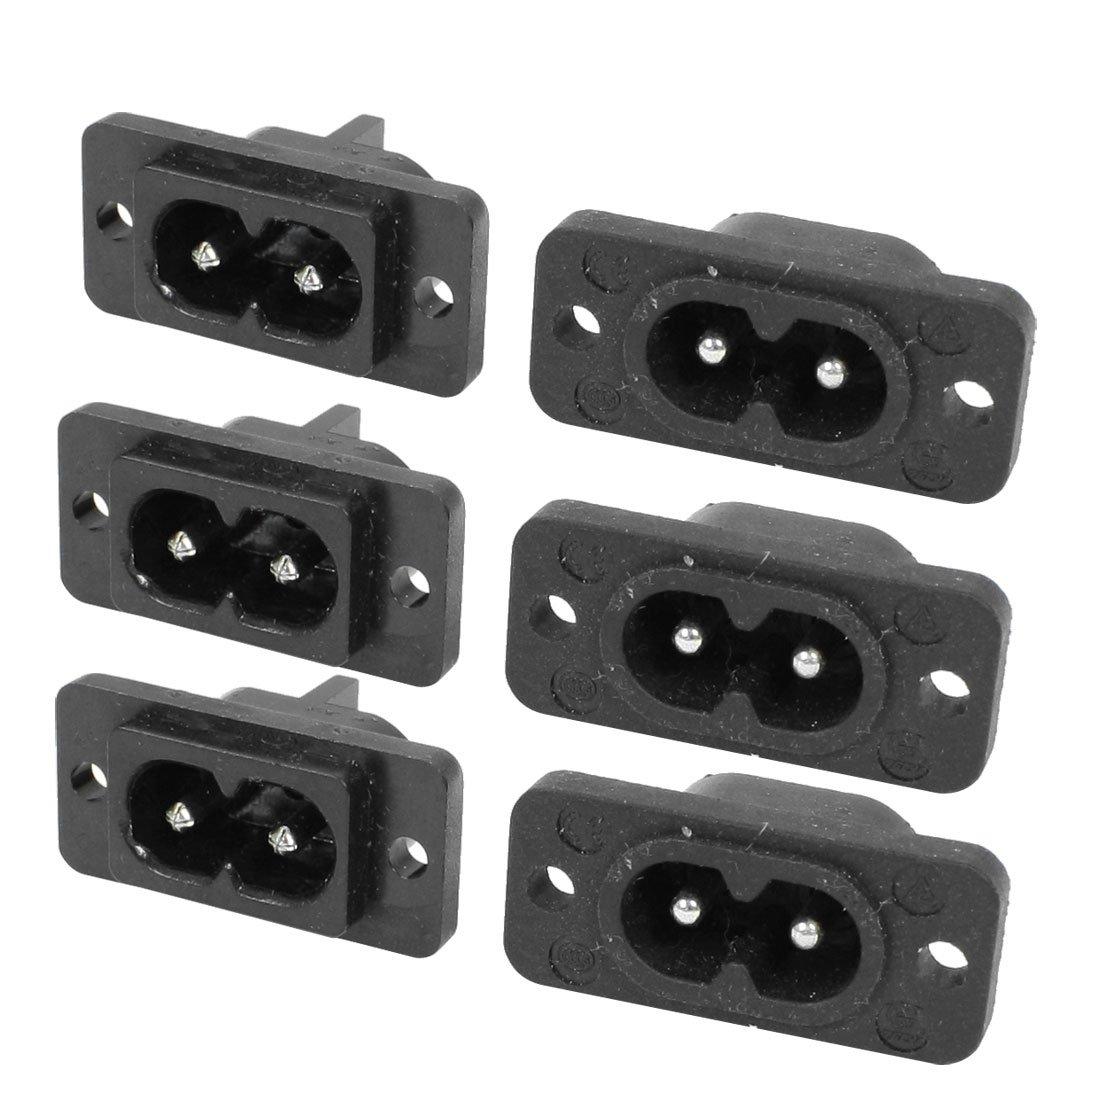 Black 2 Pin IEC320 C8 Screw Mount Inlet Plug Socket AC 250V 2.5A 6 Pcs